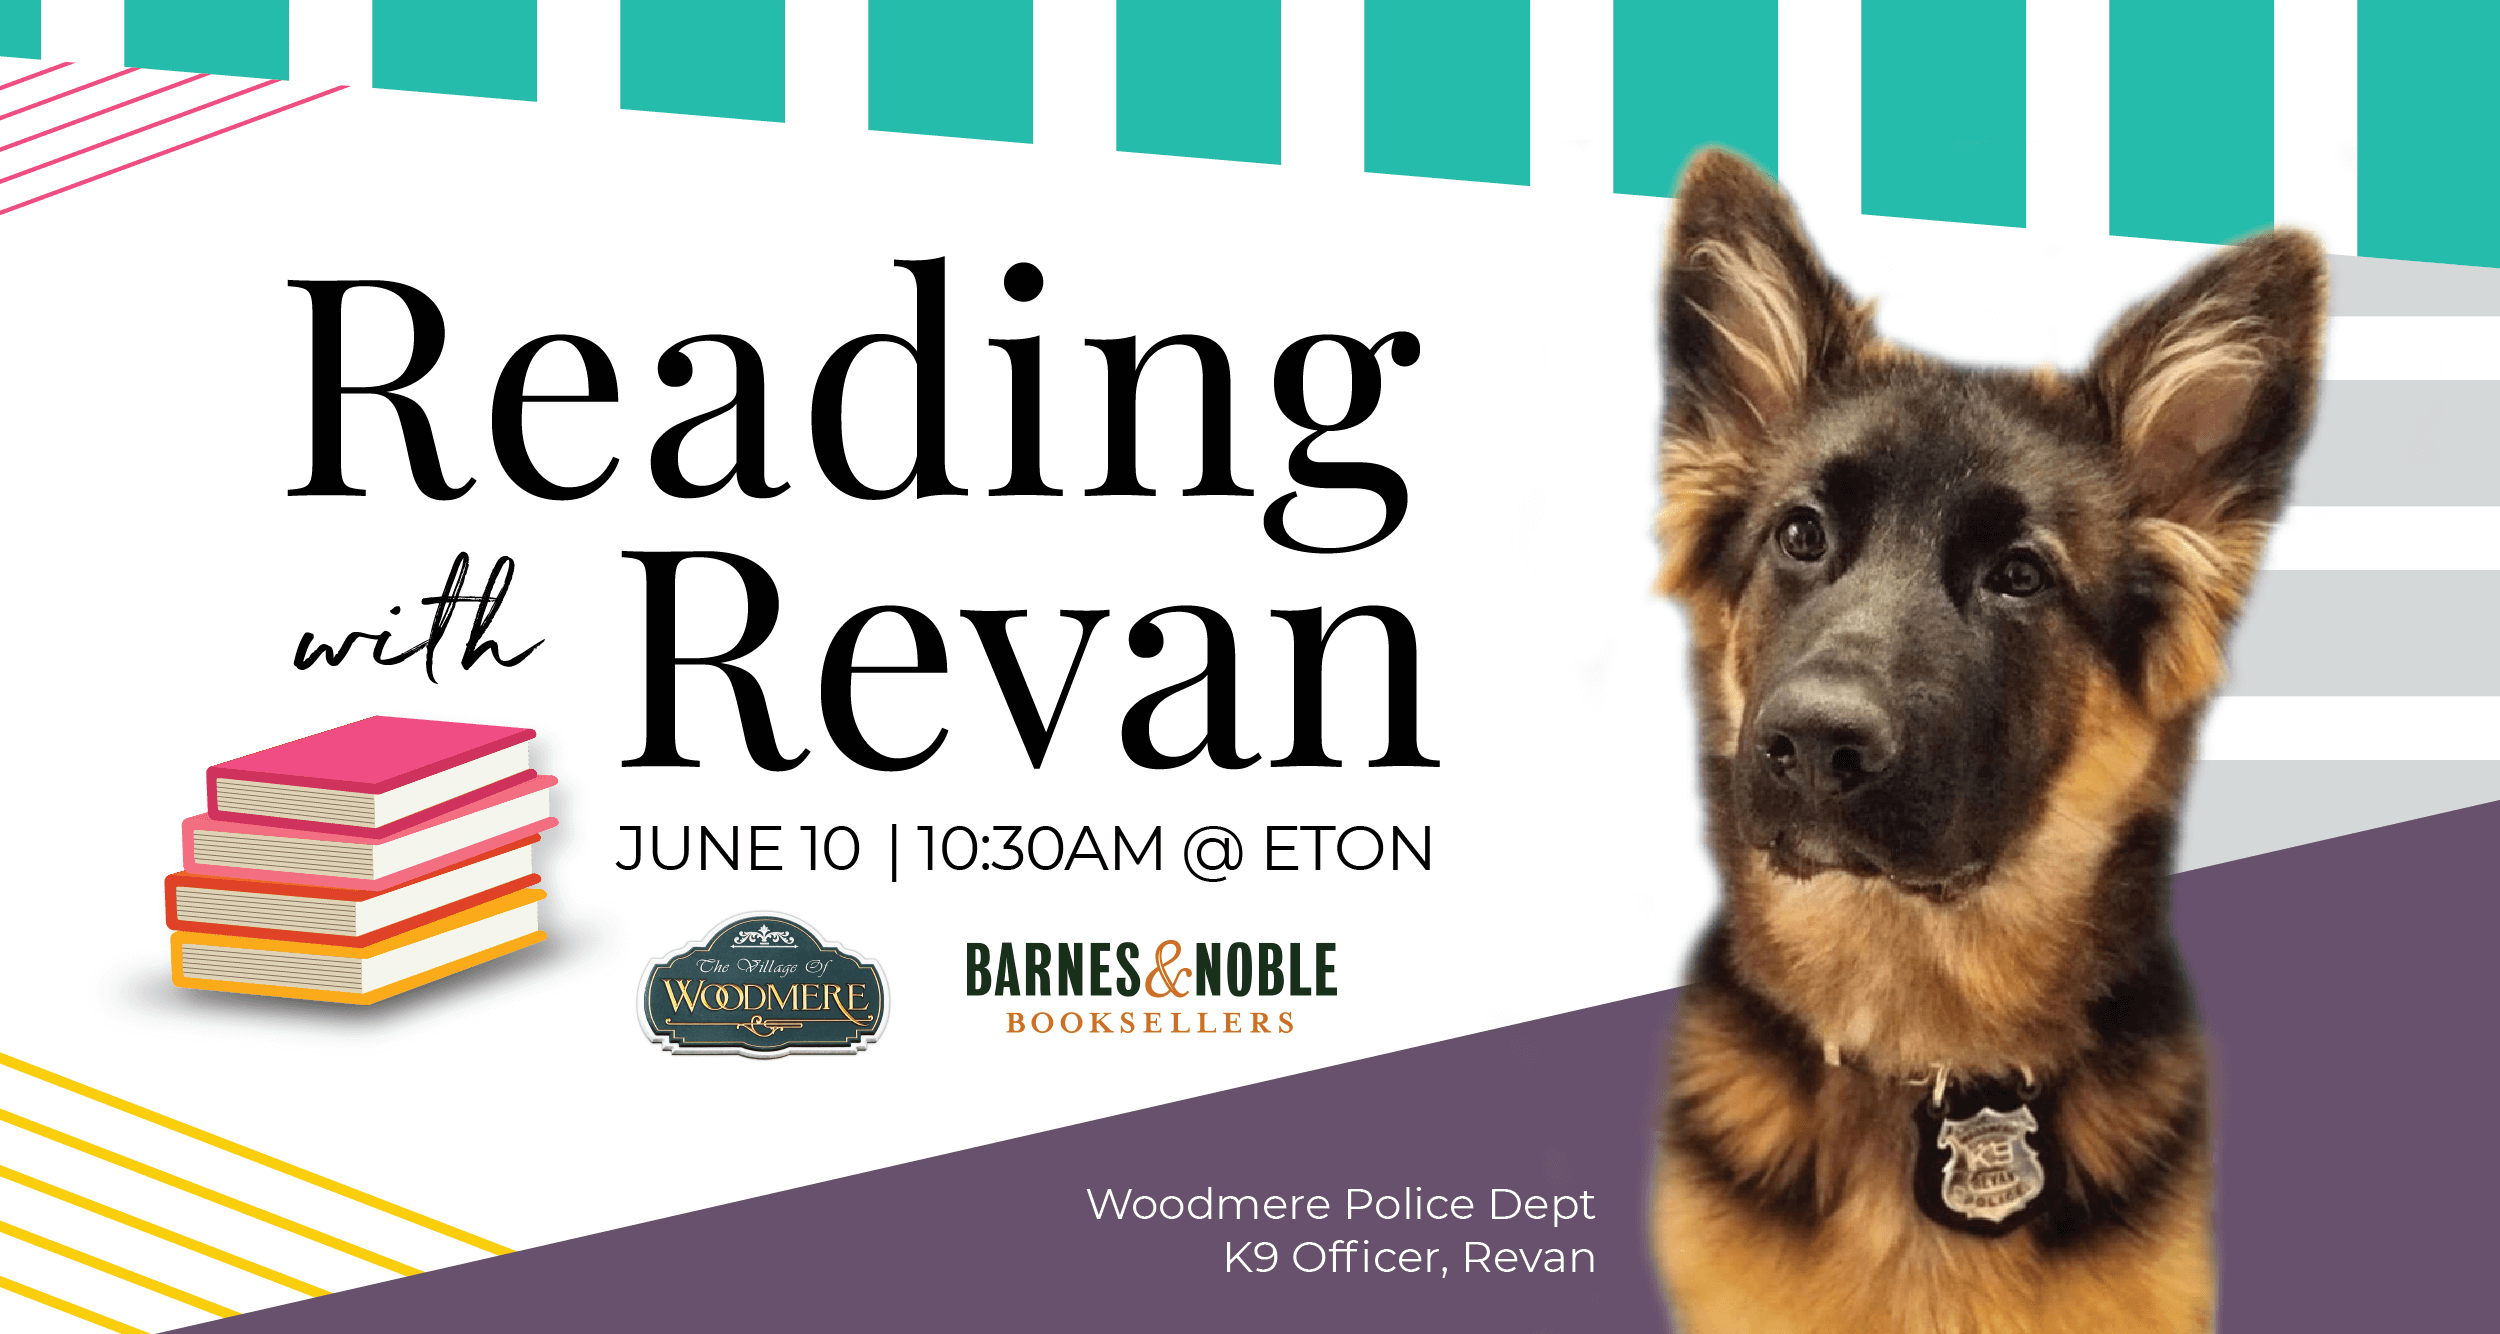 Reading with Revan